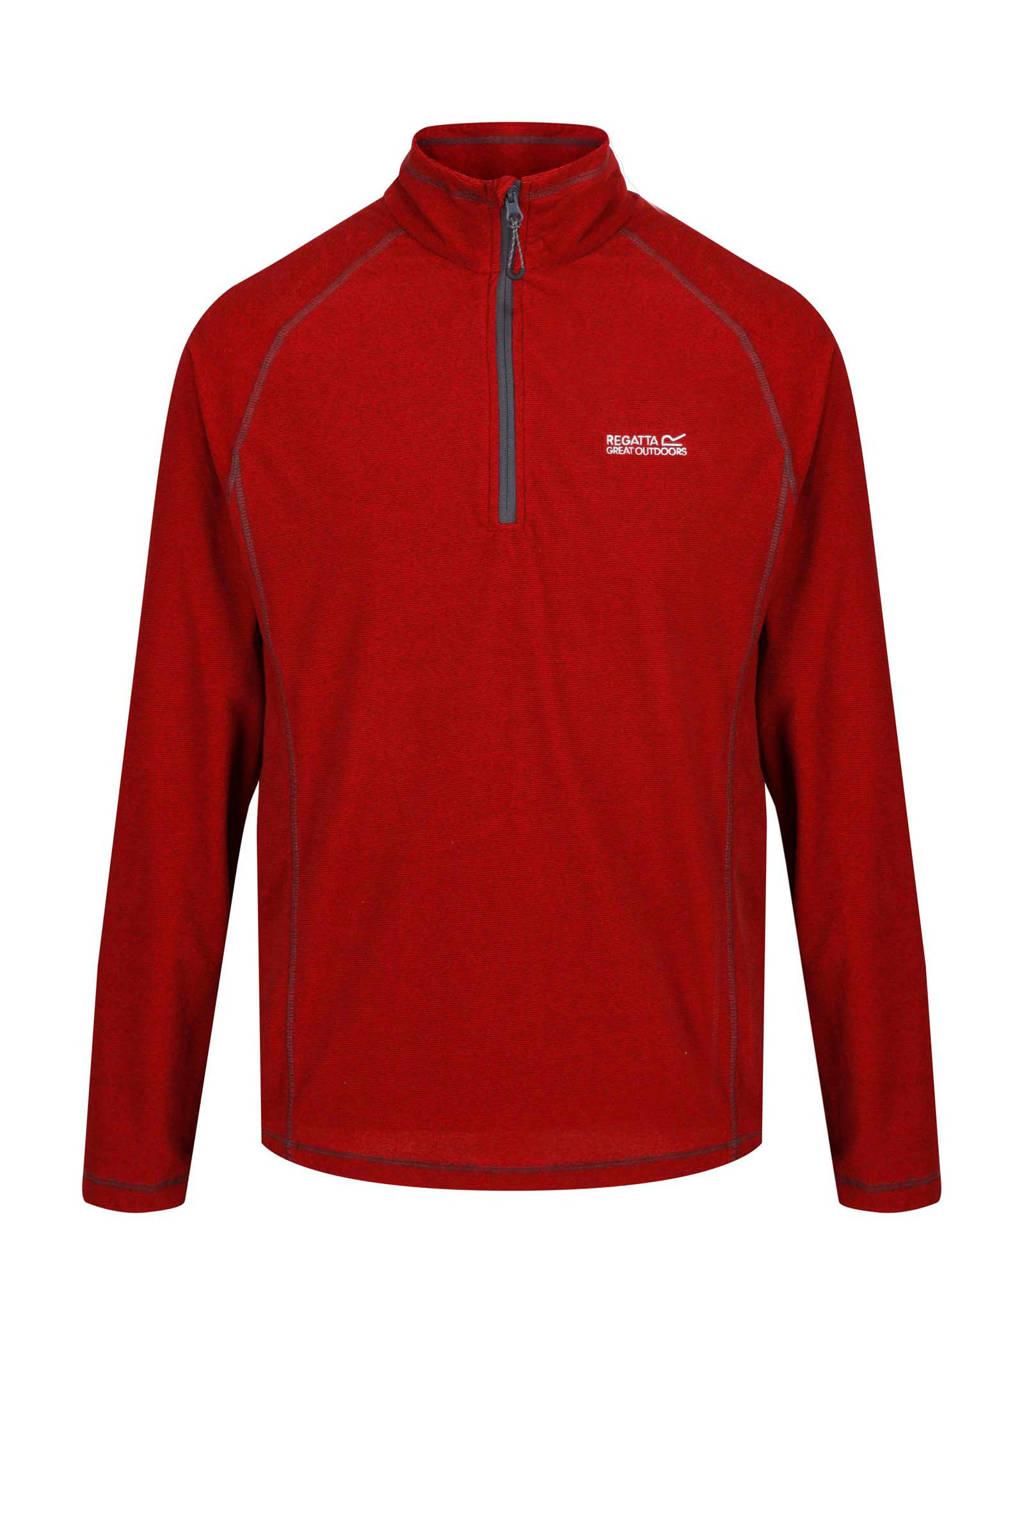 Regatta   Montes fleece jack rood, Classic Red